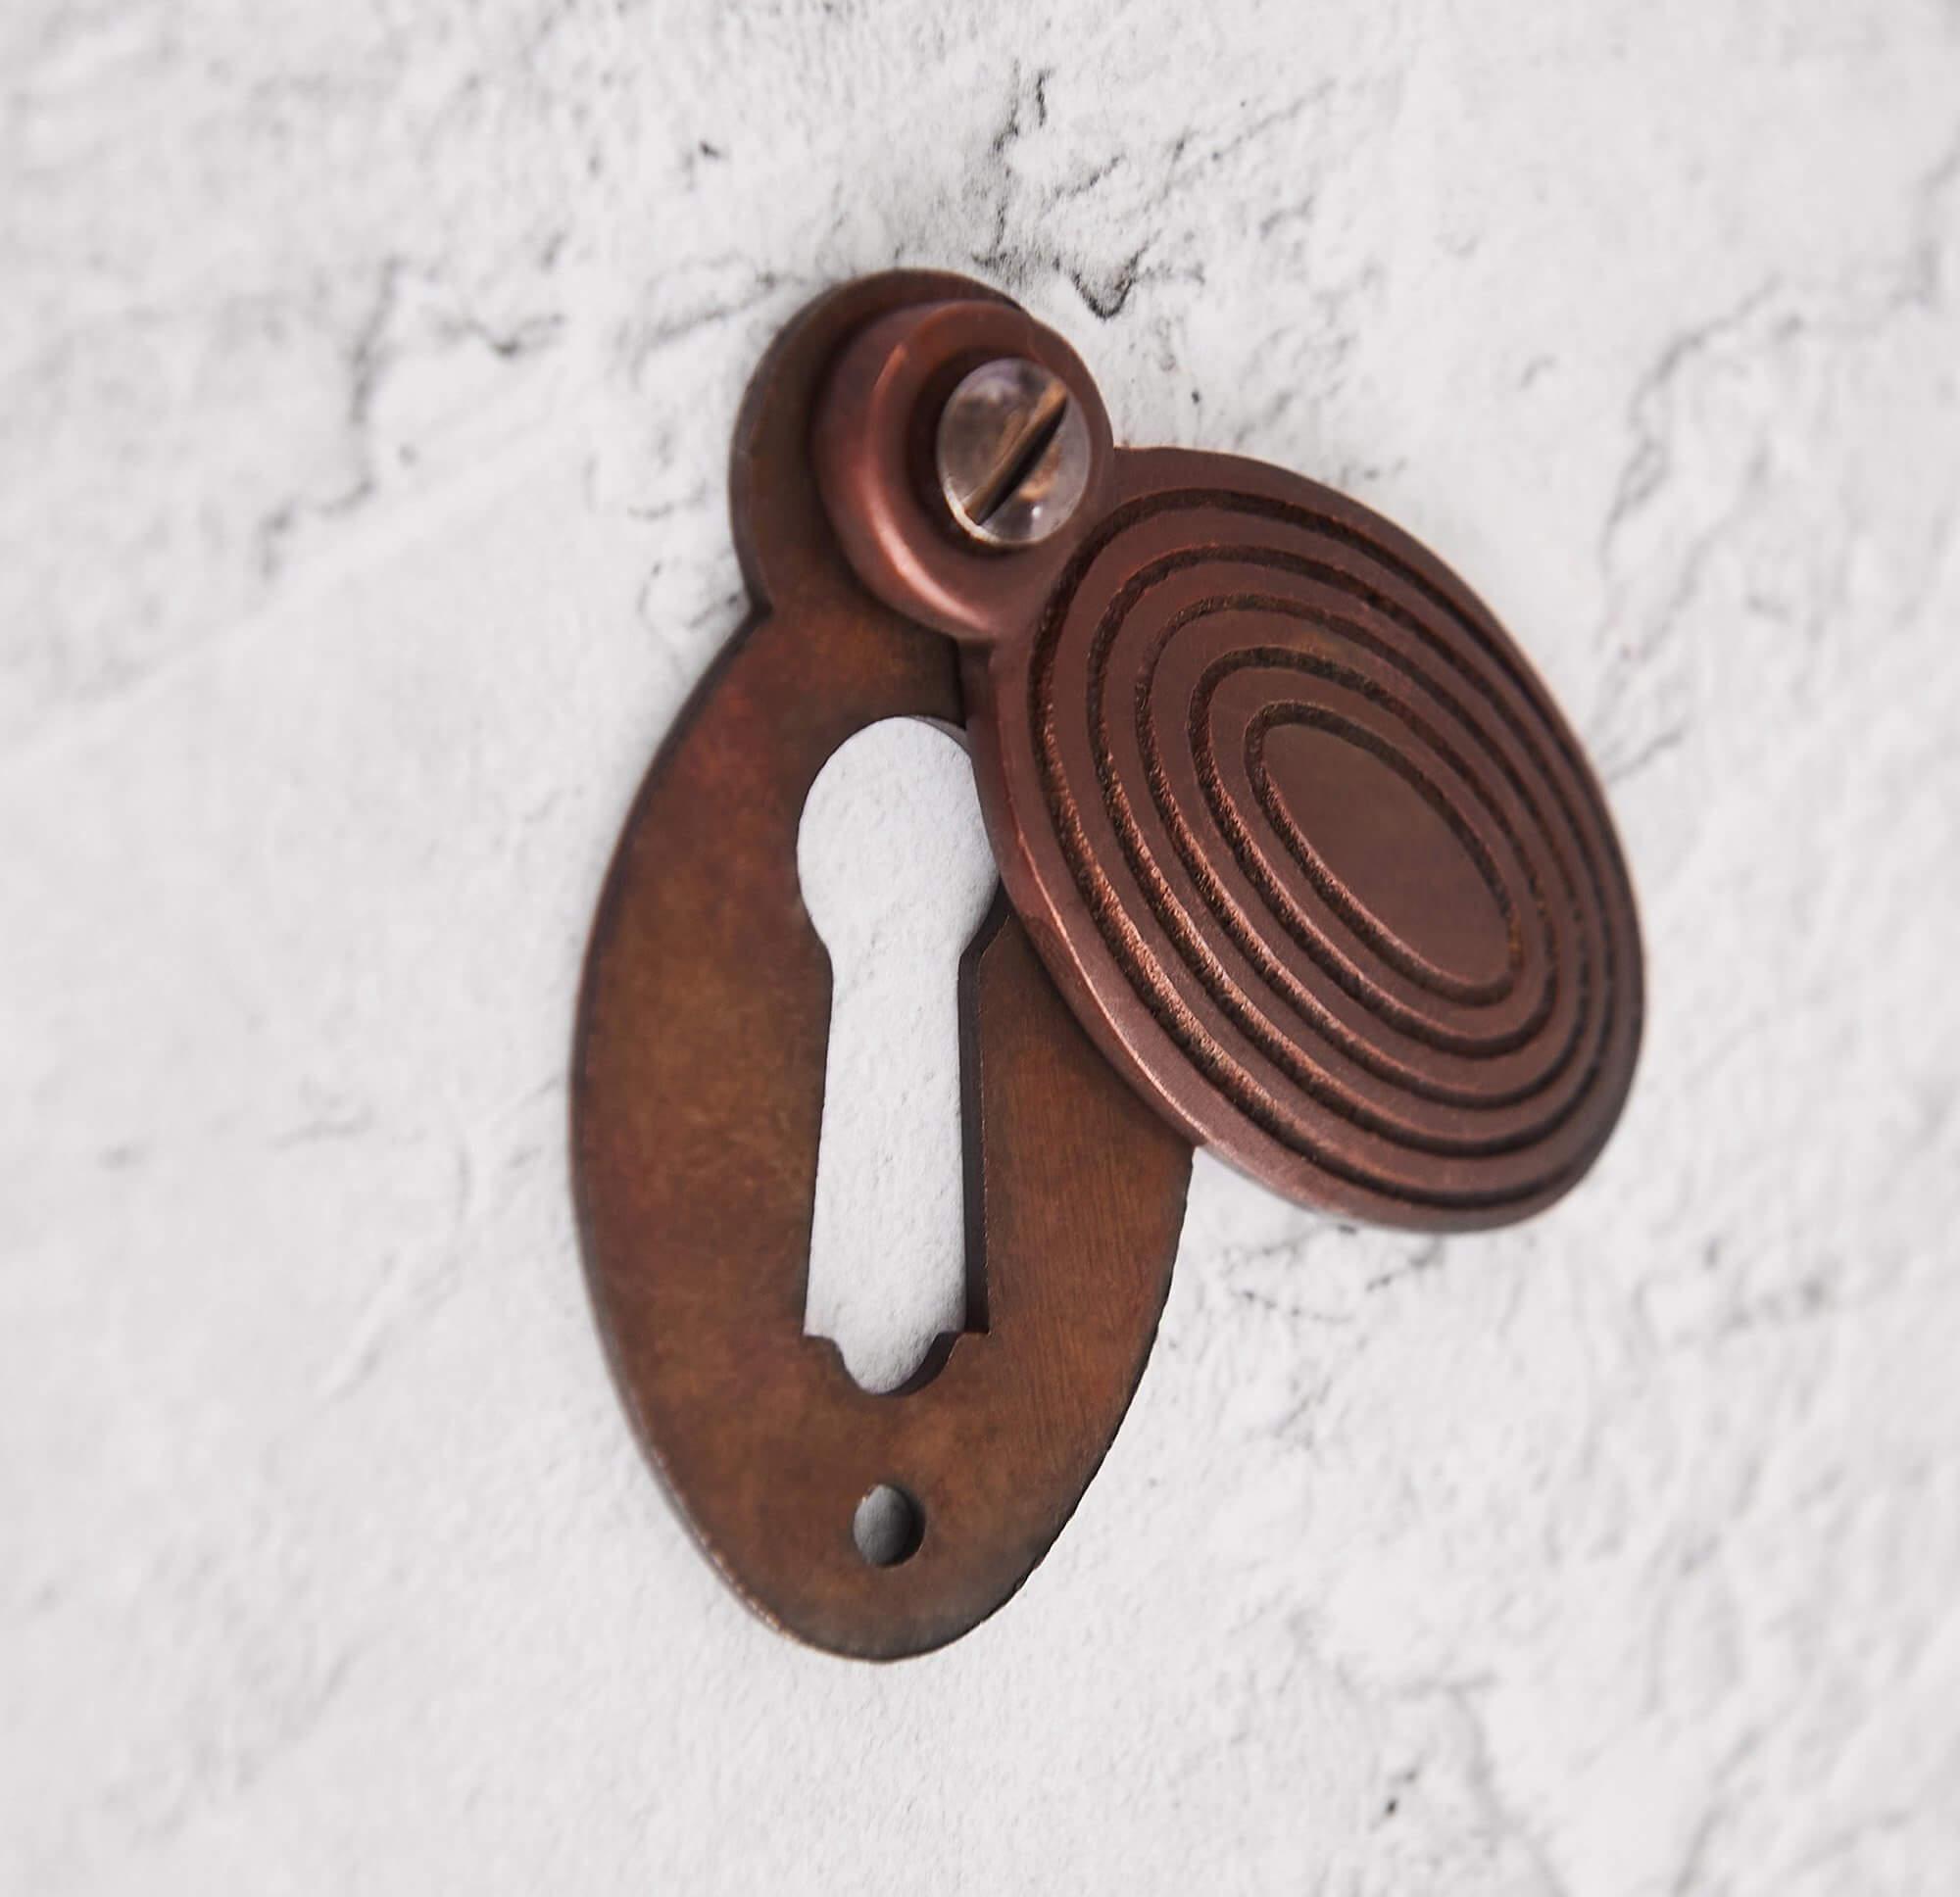 Beehive Escutcheon - Aged Bronze